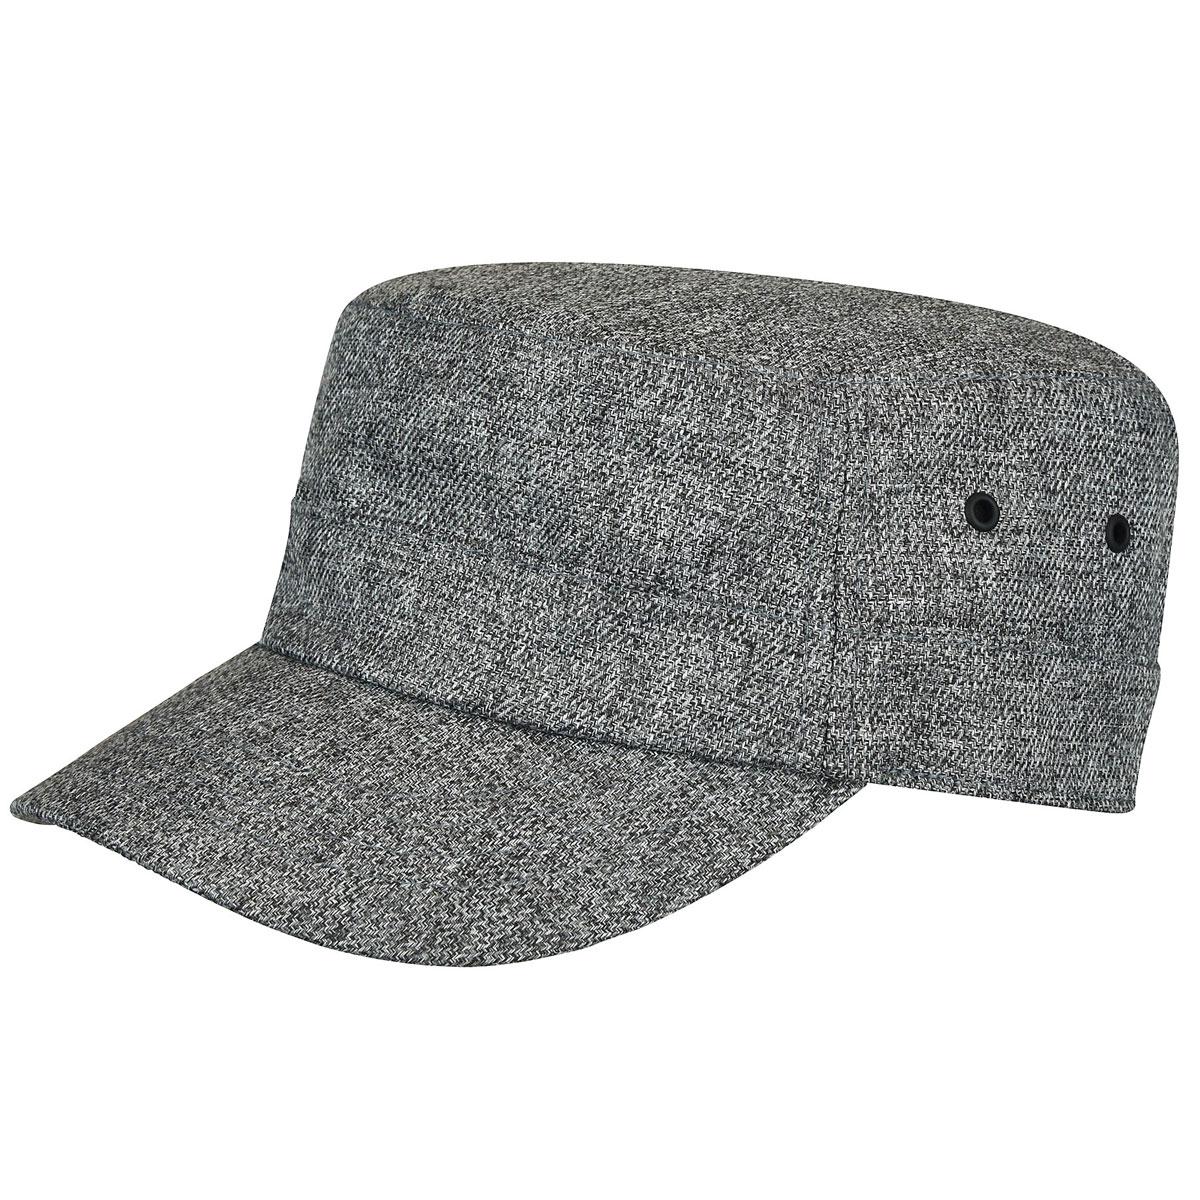 Bailey of Hollywood Sanville Army Cap in Grey